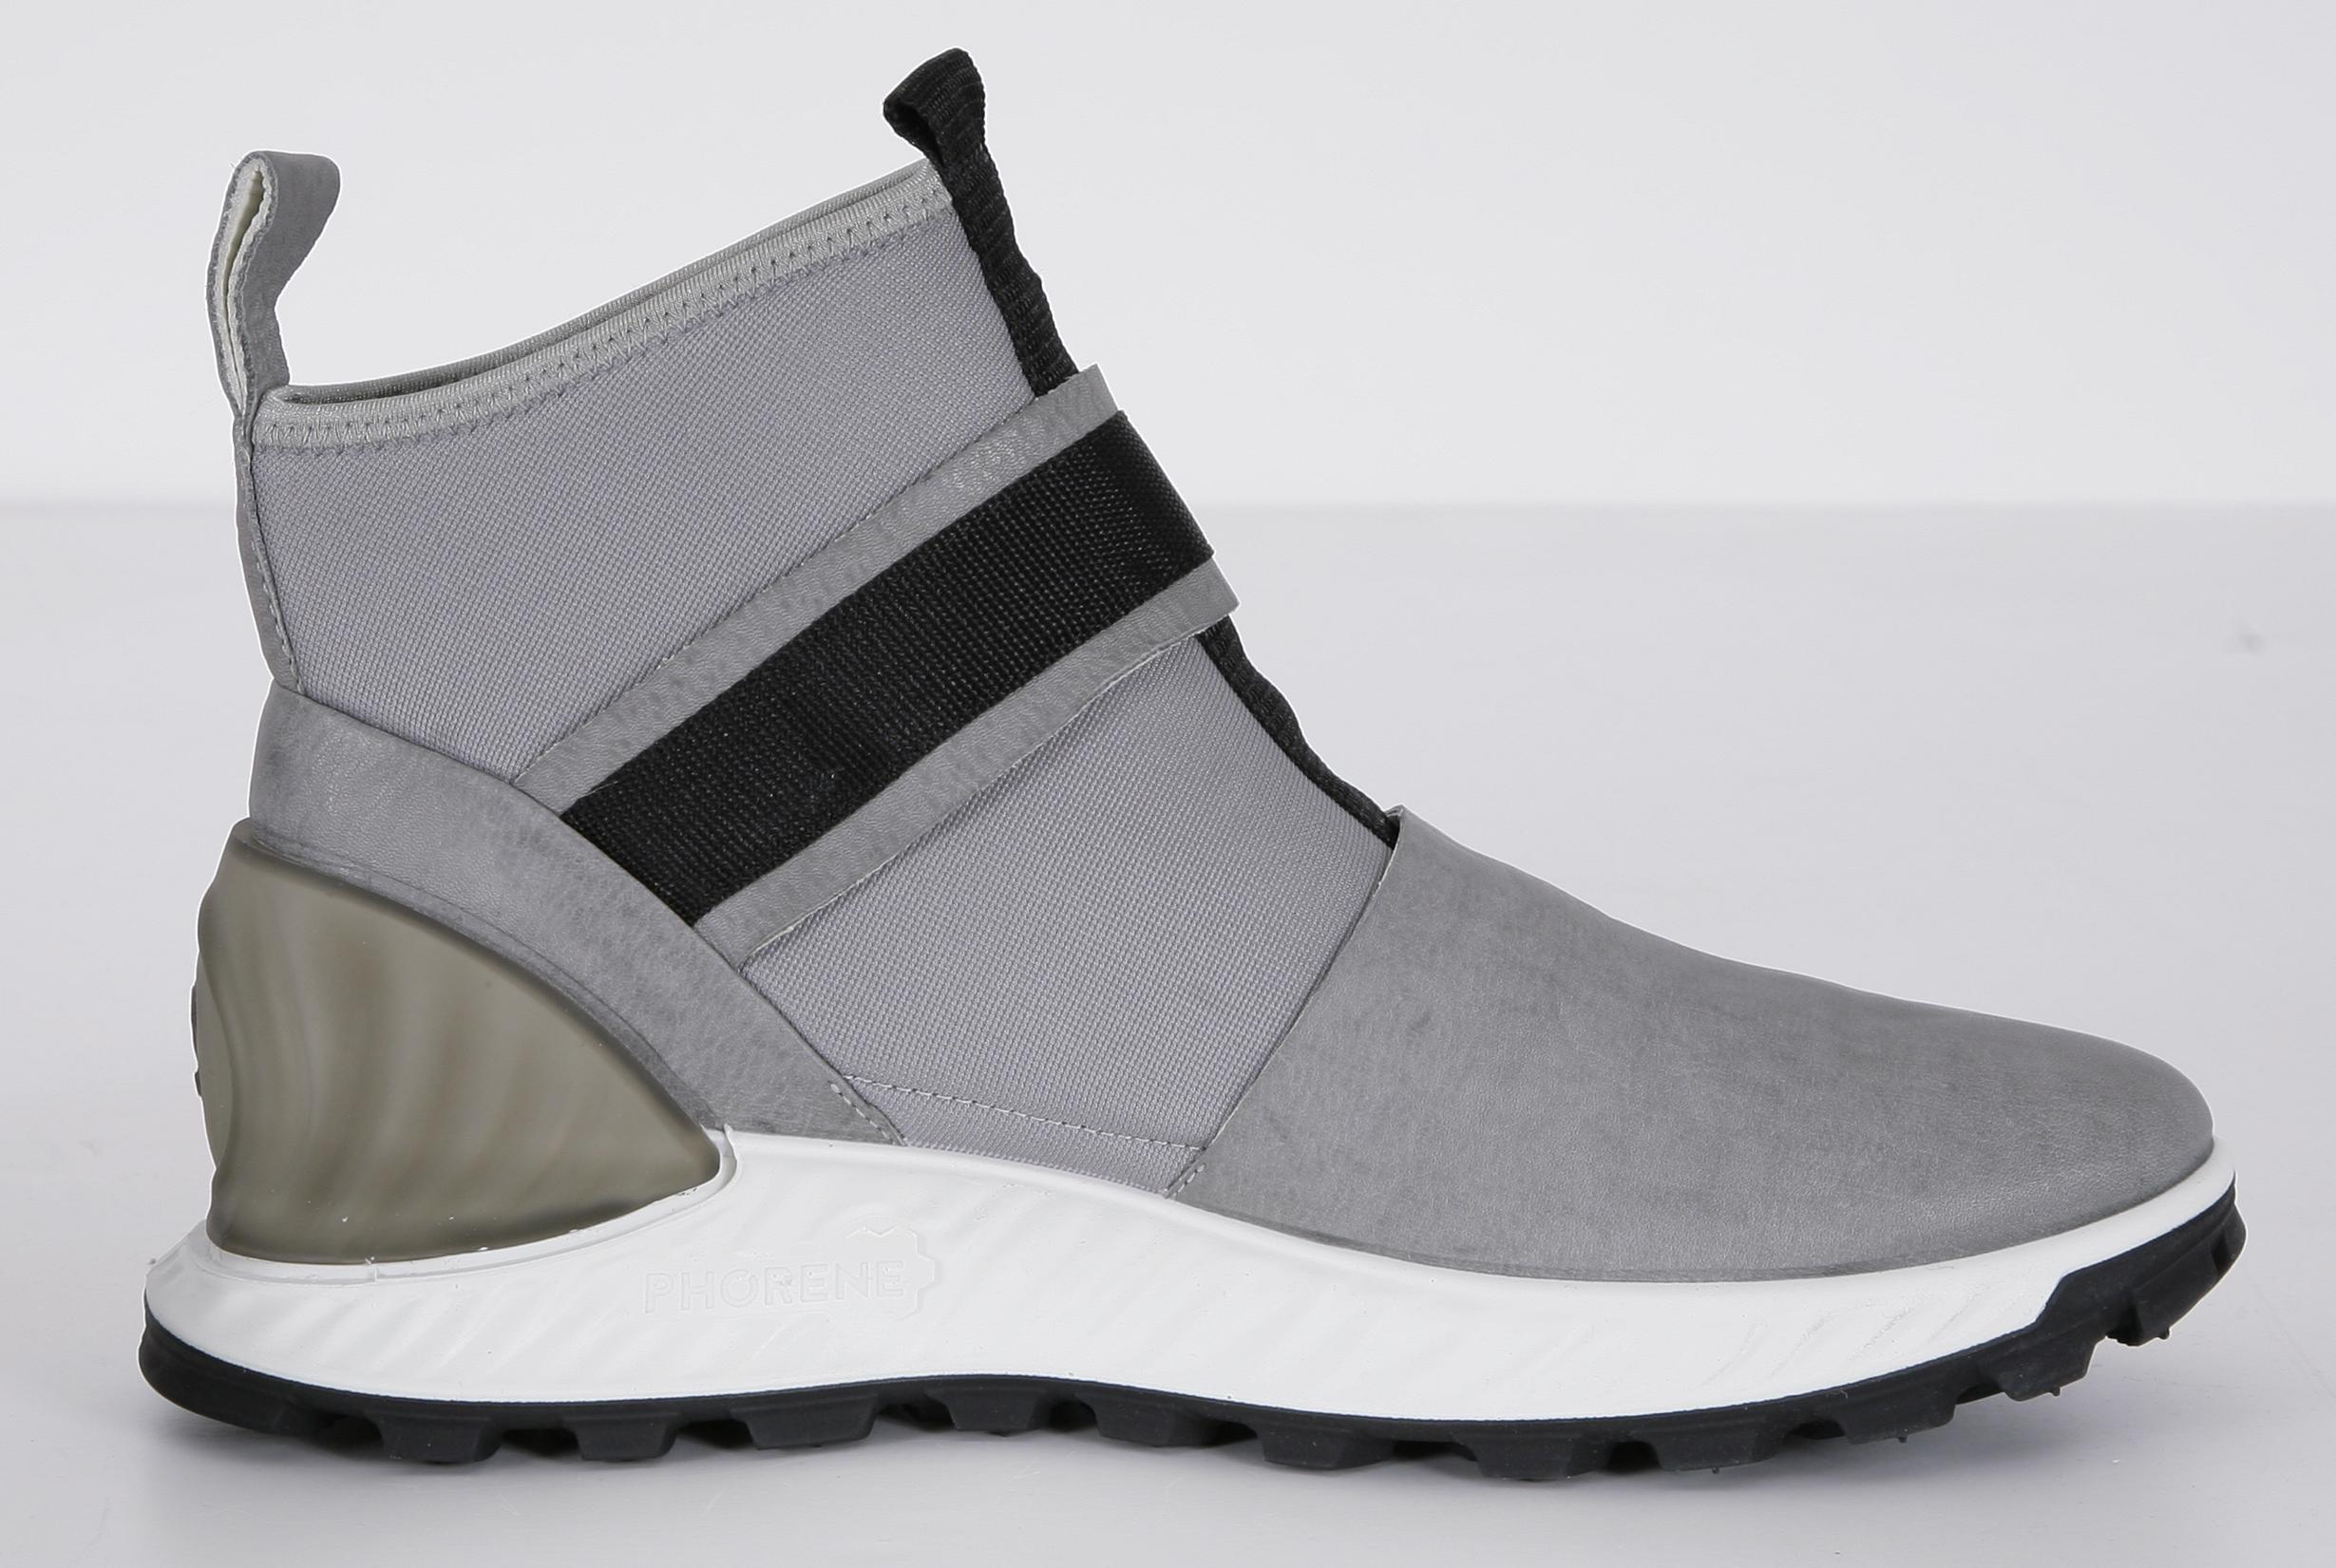 The Last Conspiracy X ECCO IKEDA Sneakers